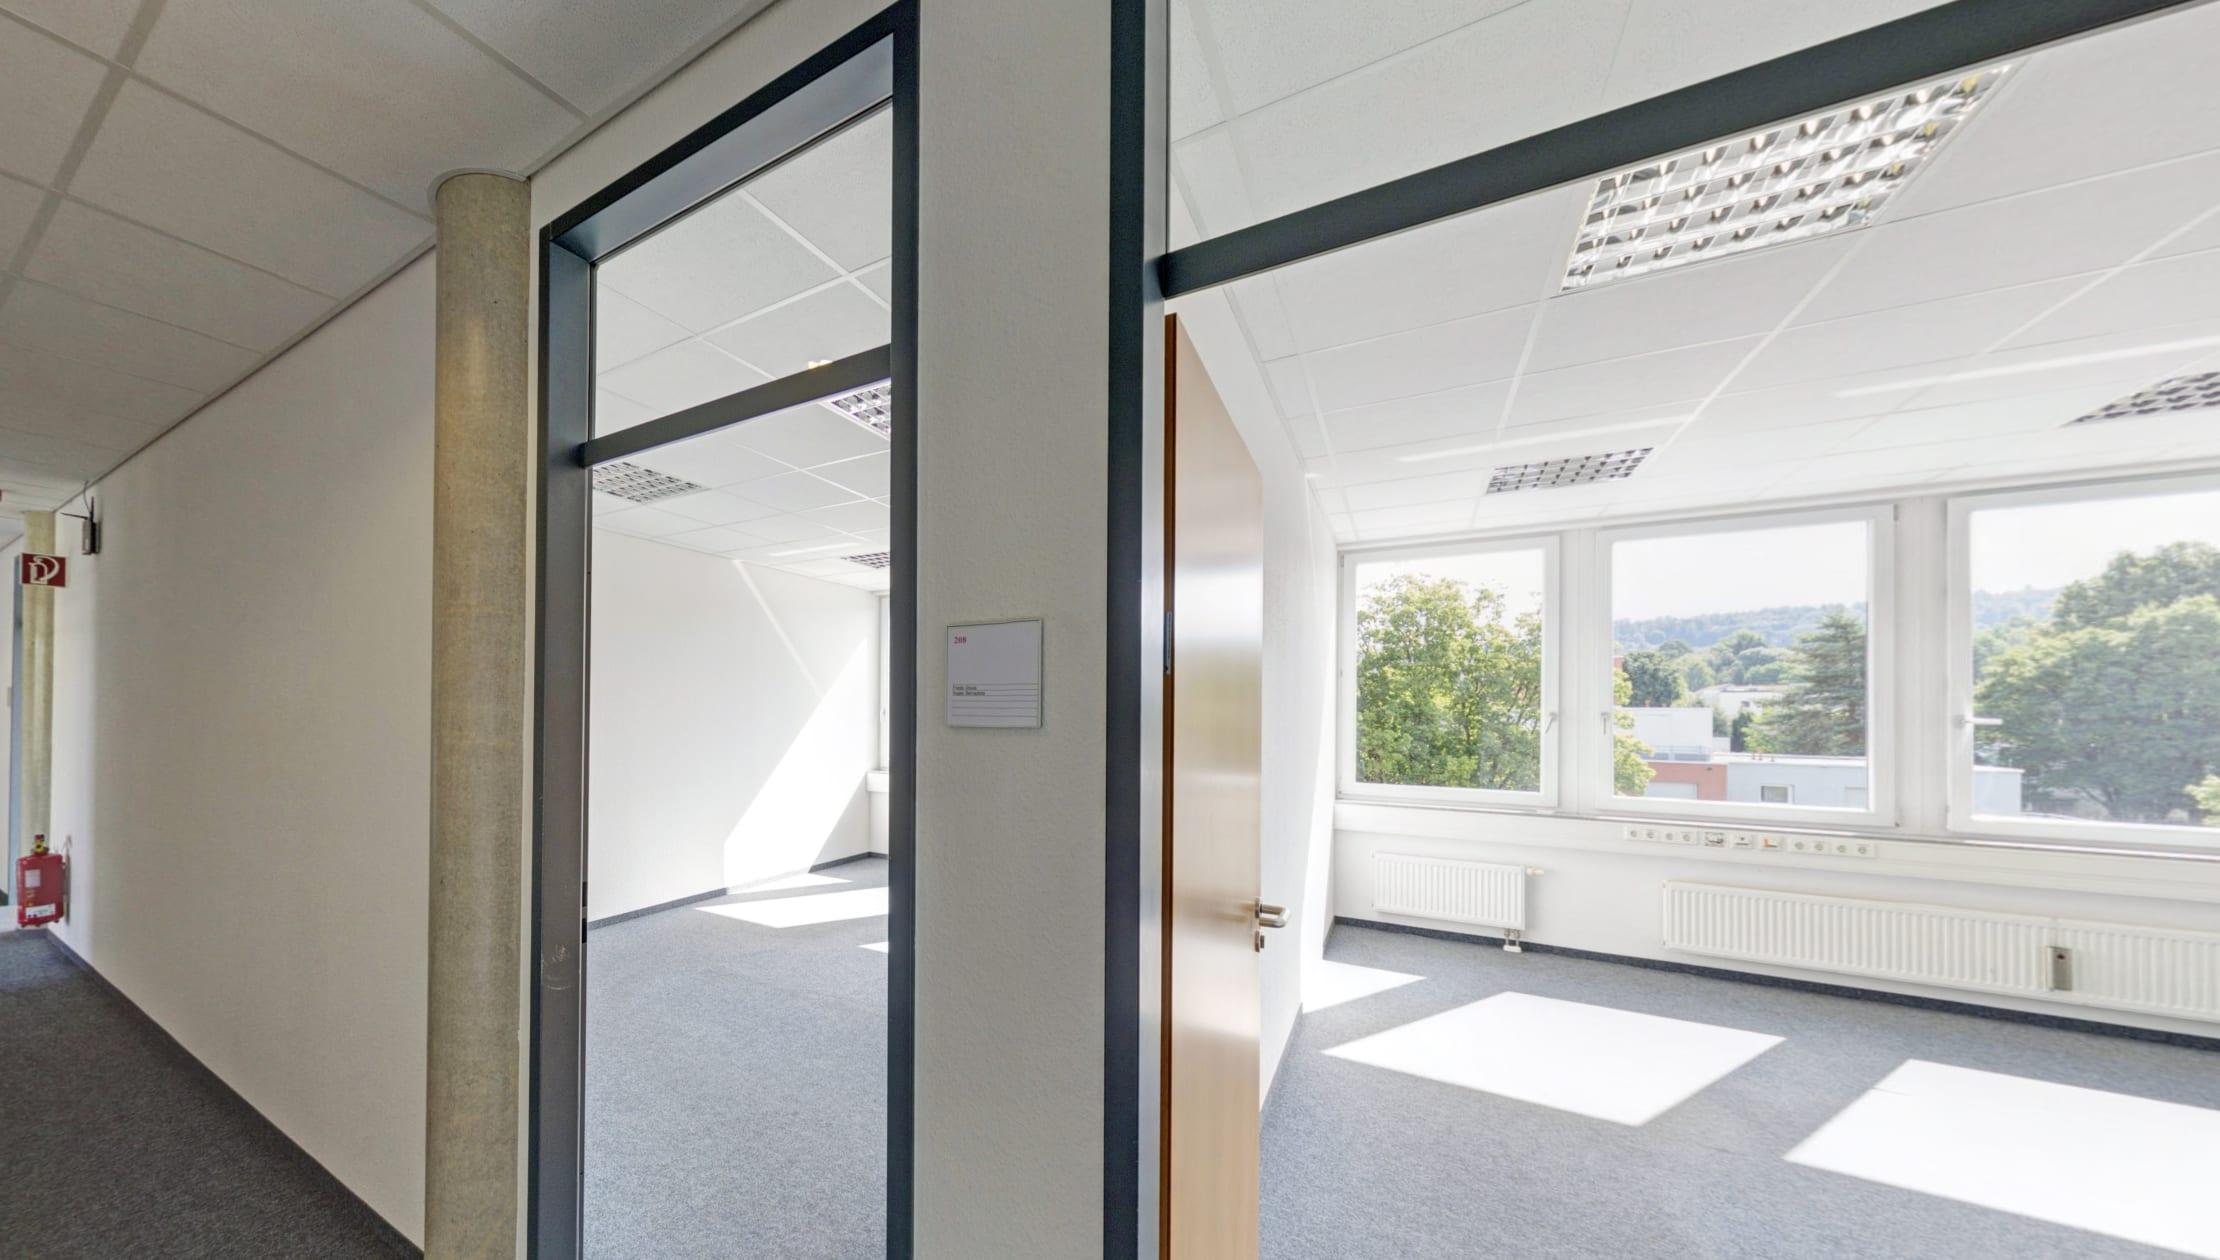 Objekt Weingarten 360 Grad Rundgang